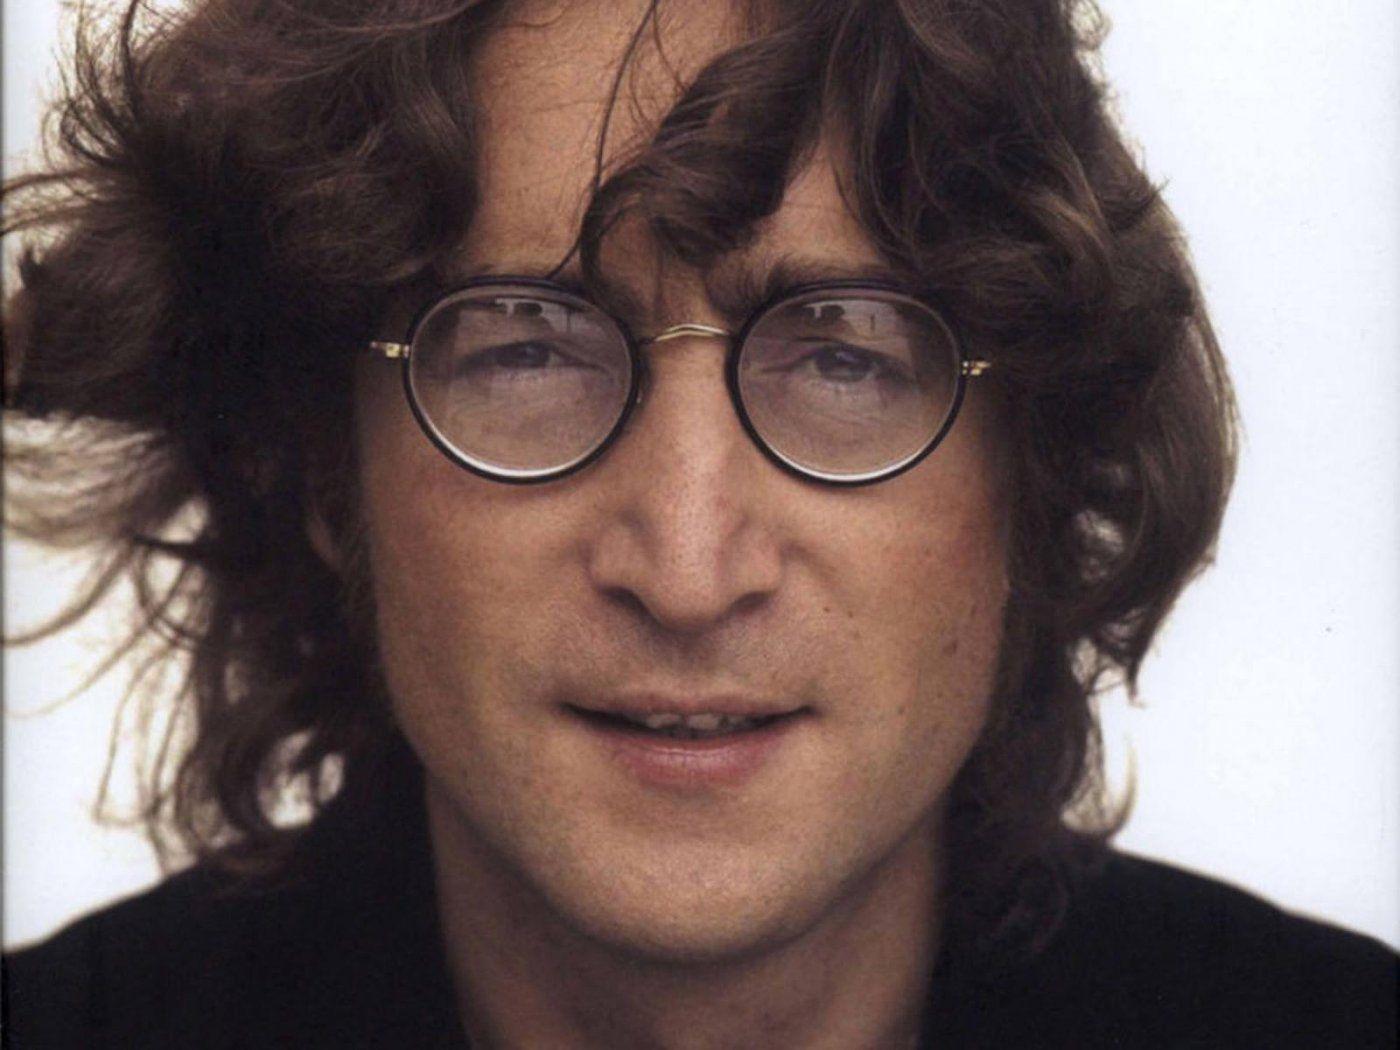 John Lennon: frasi celebri e citazioni del leggendario musicista dei Beatles